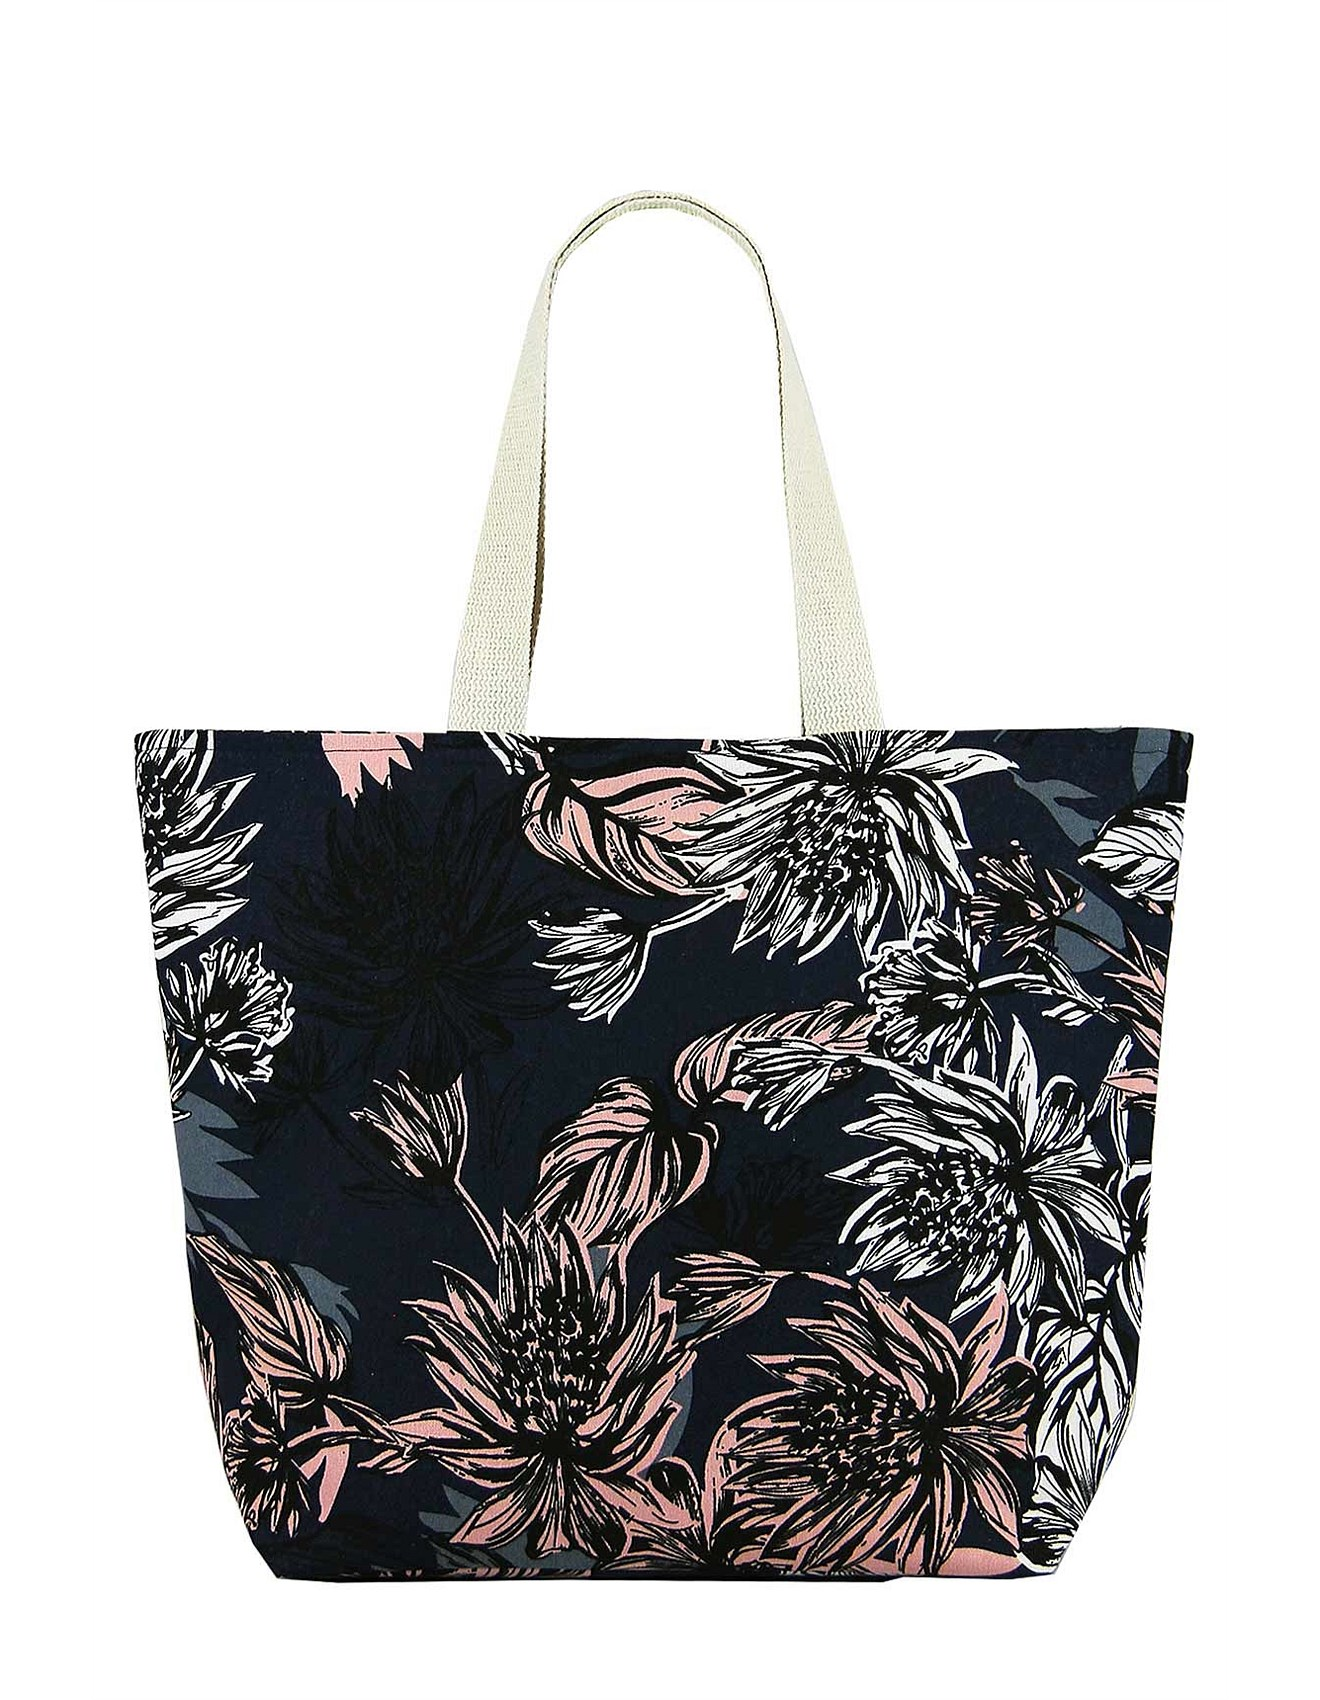 Designer Handbags For Women  db52fec50c890